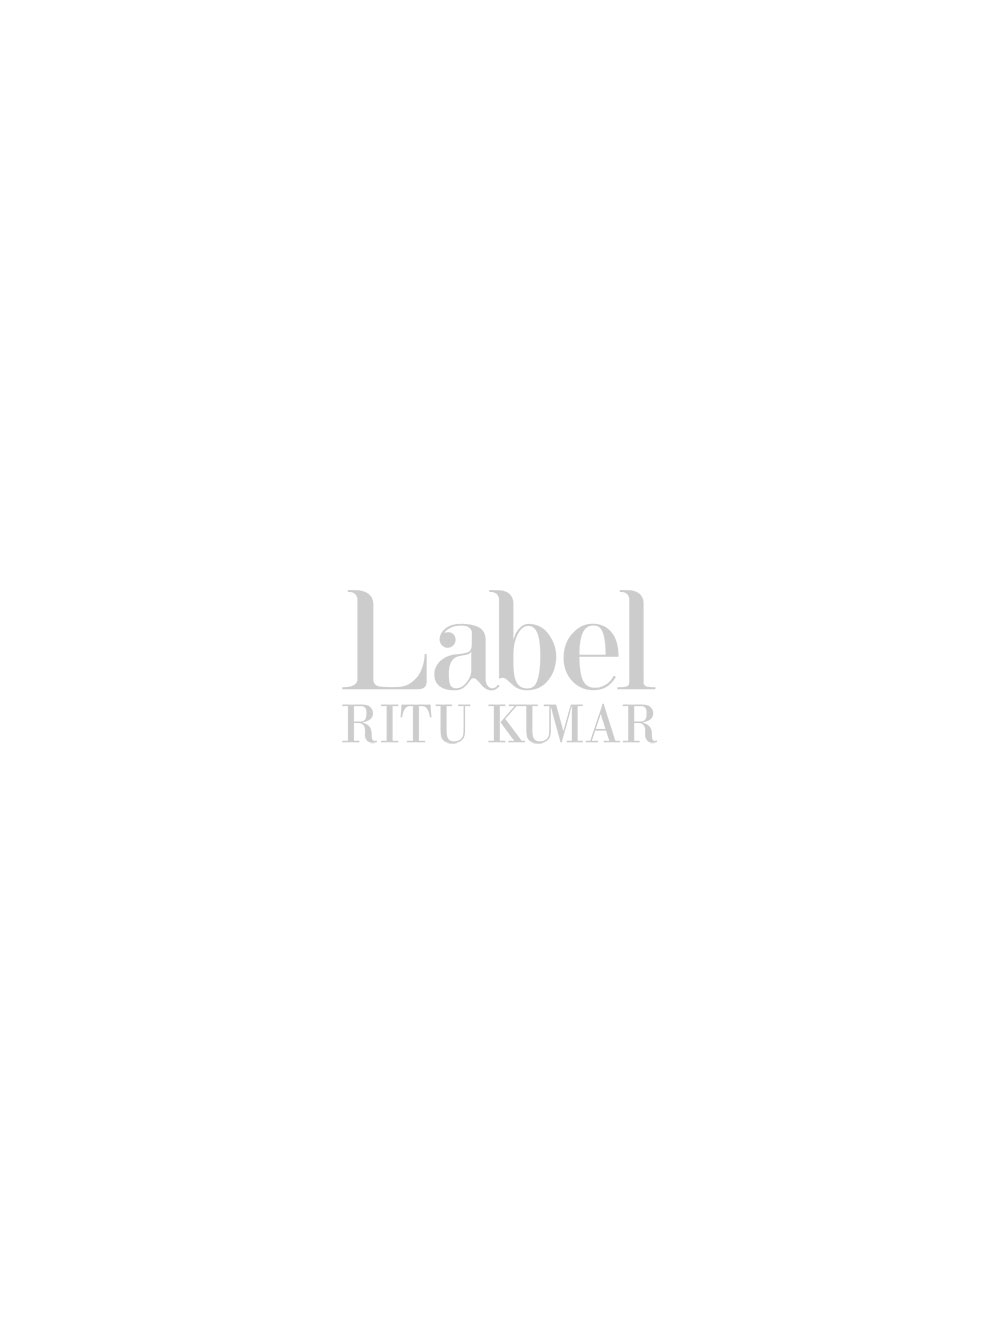 Green Full Sleeved Top With signature Label Ritu Kumar Prints